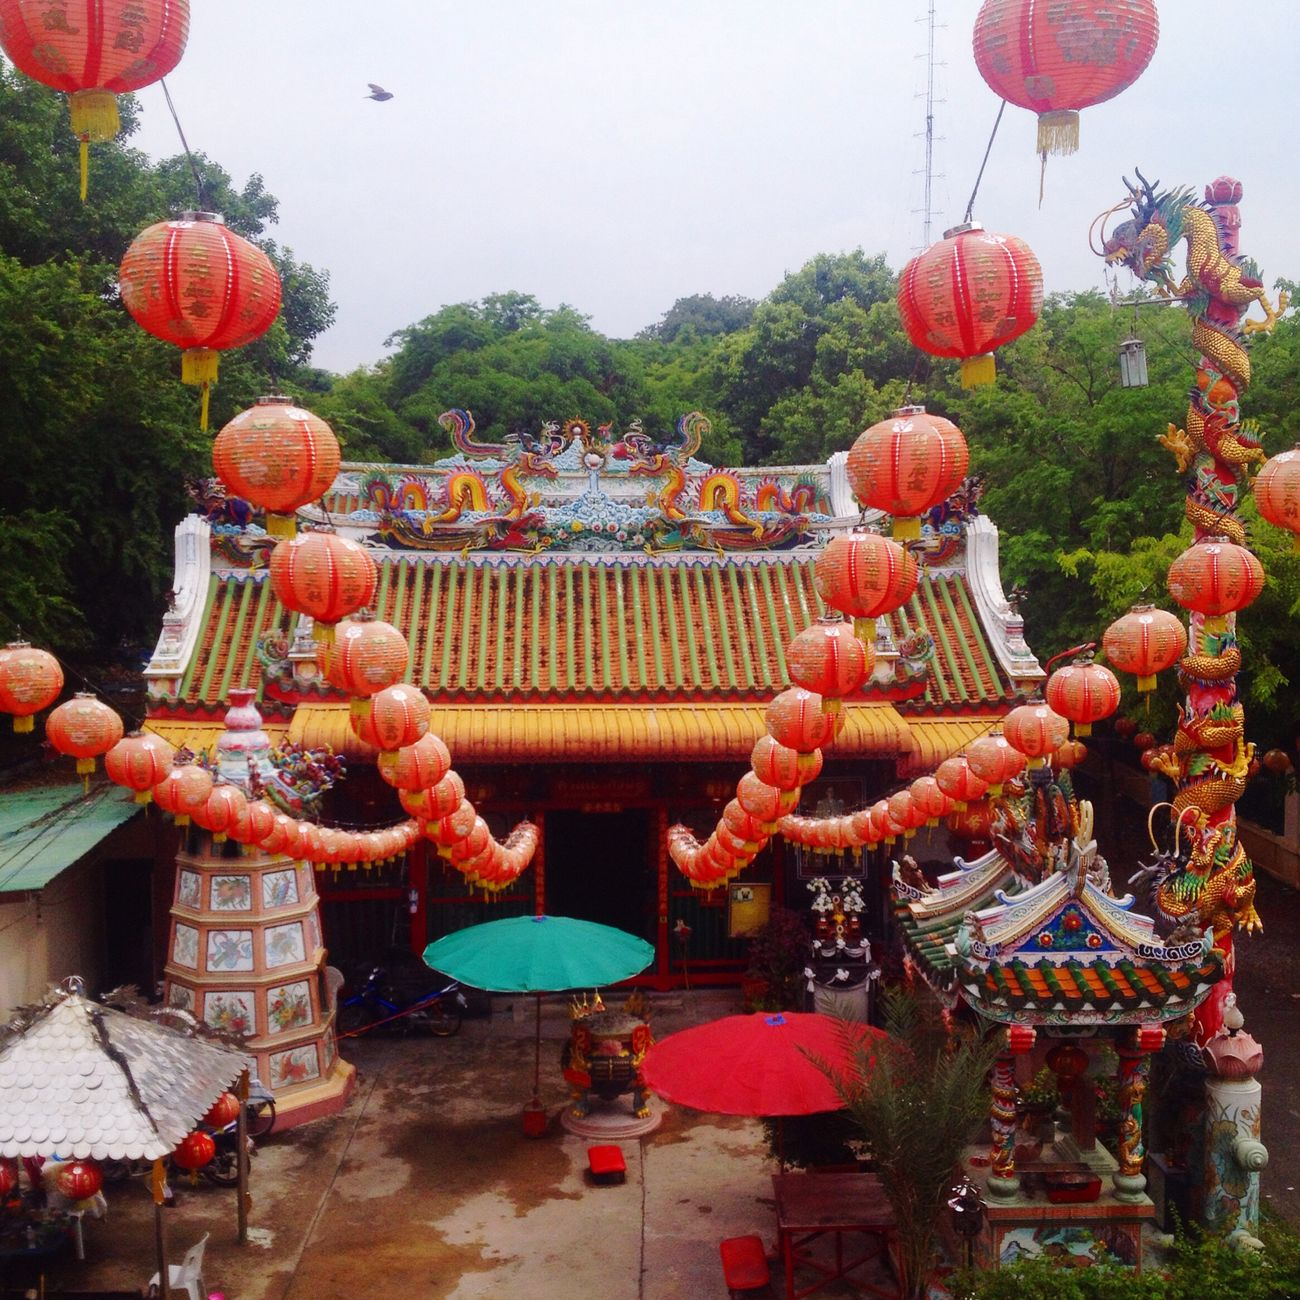 Shrine Chinese Lantern Lantern Hanging Decoration Outdoors Cultures ศาลเจ้ากวนอู